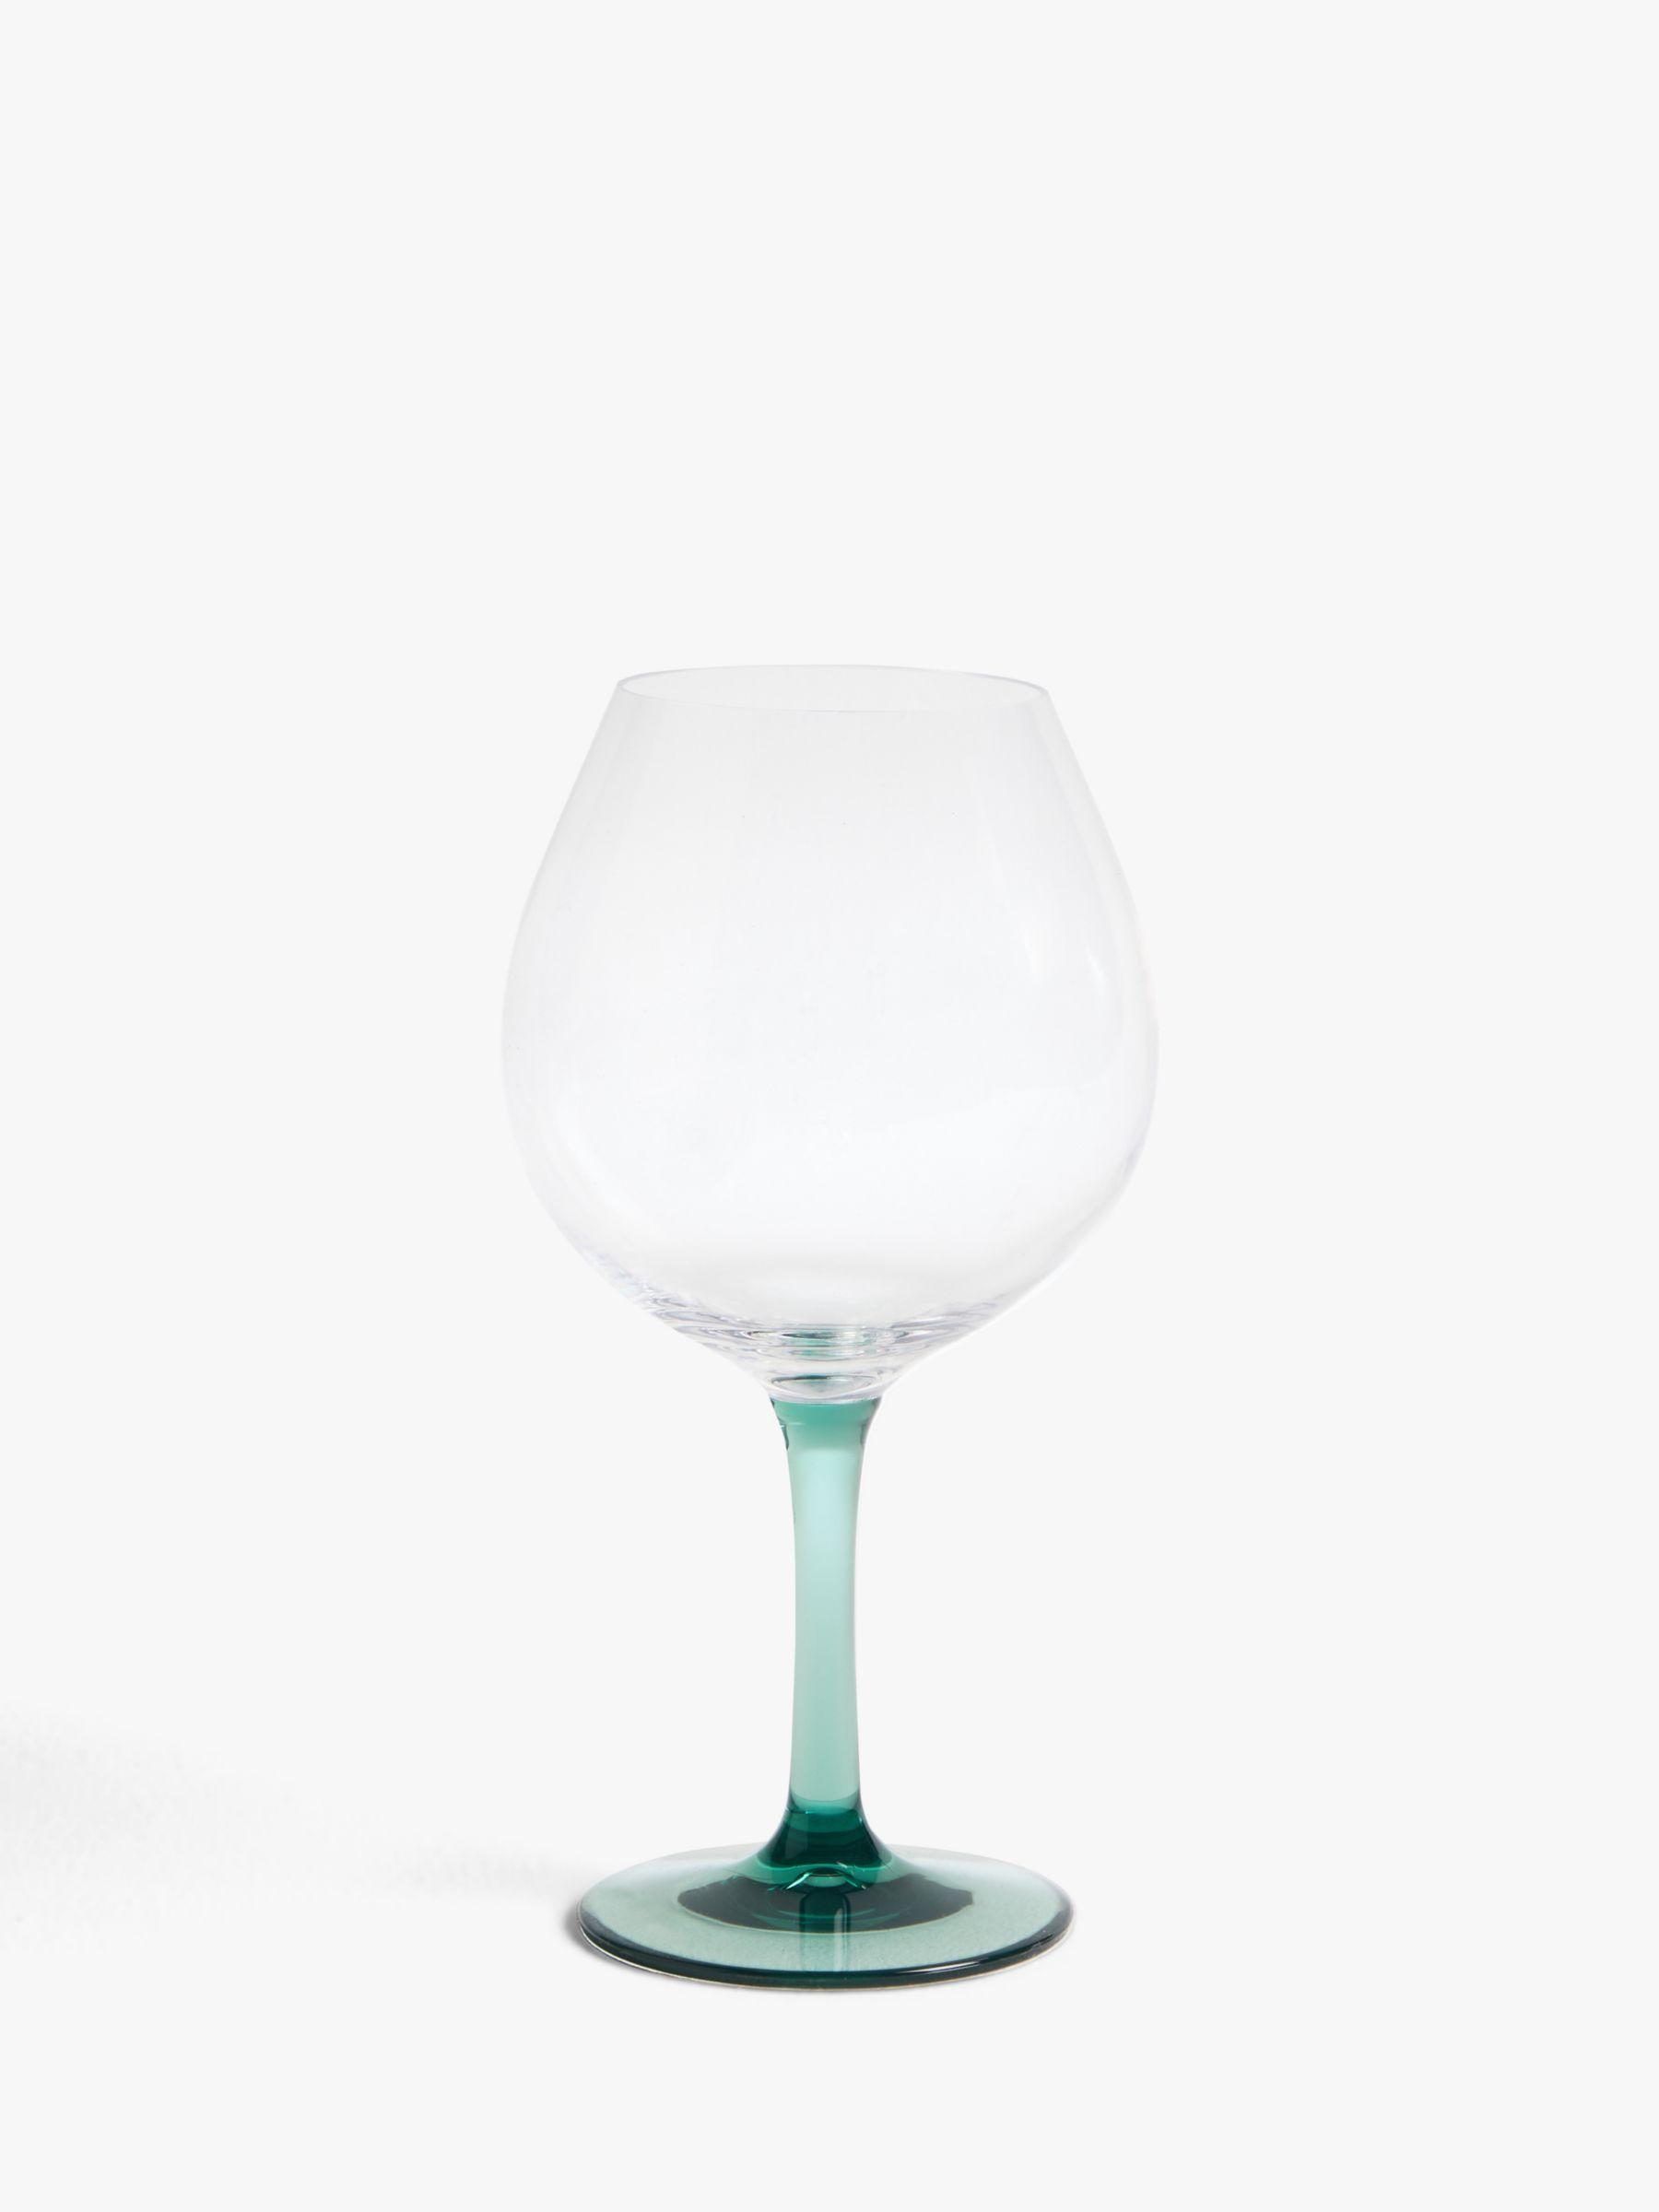 John Lewis & Partners Plastic Gin Glass, Set of 2, 650ml, Blue/Green